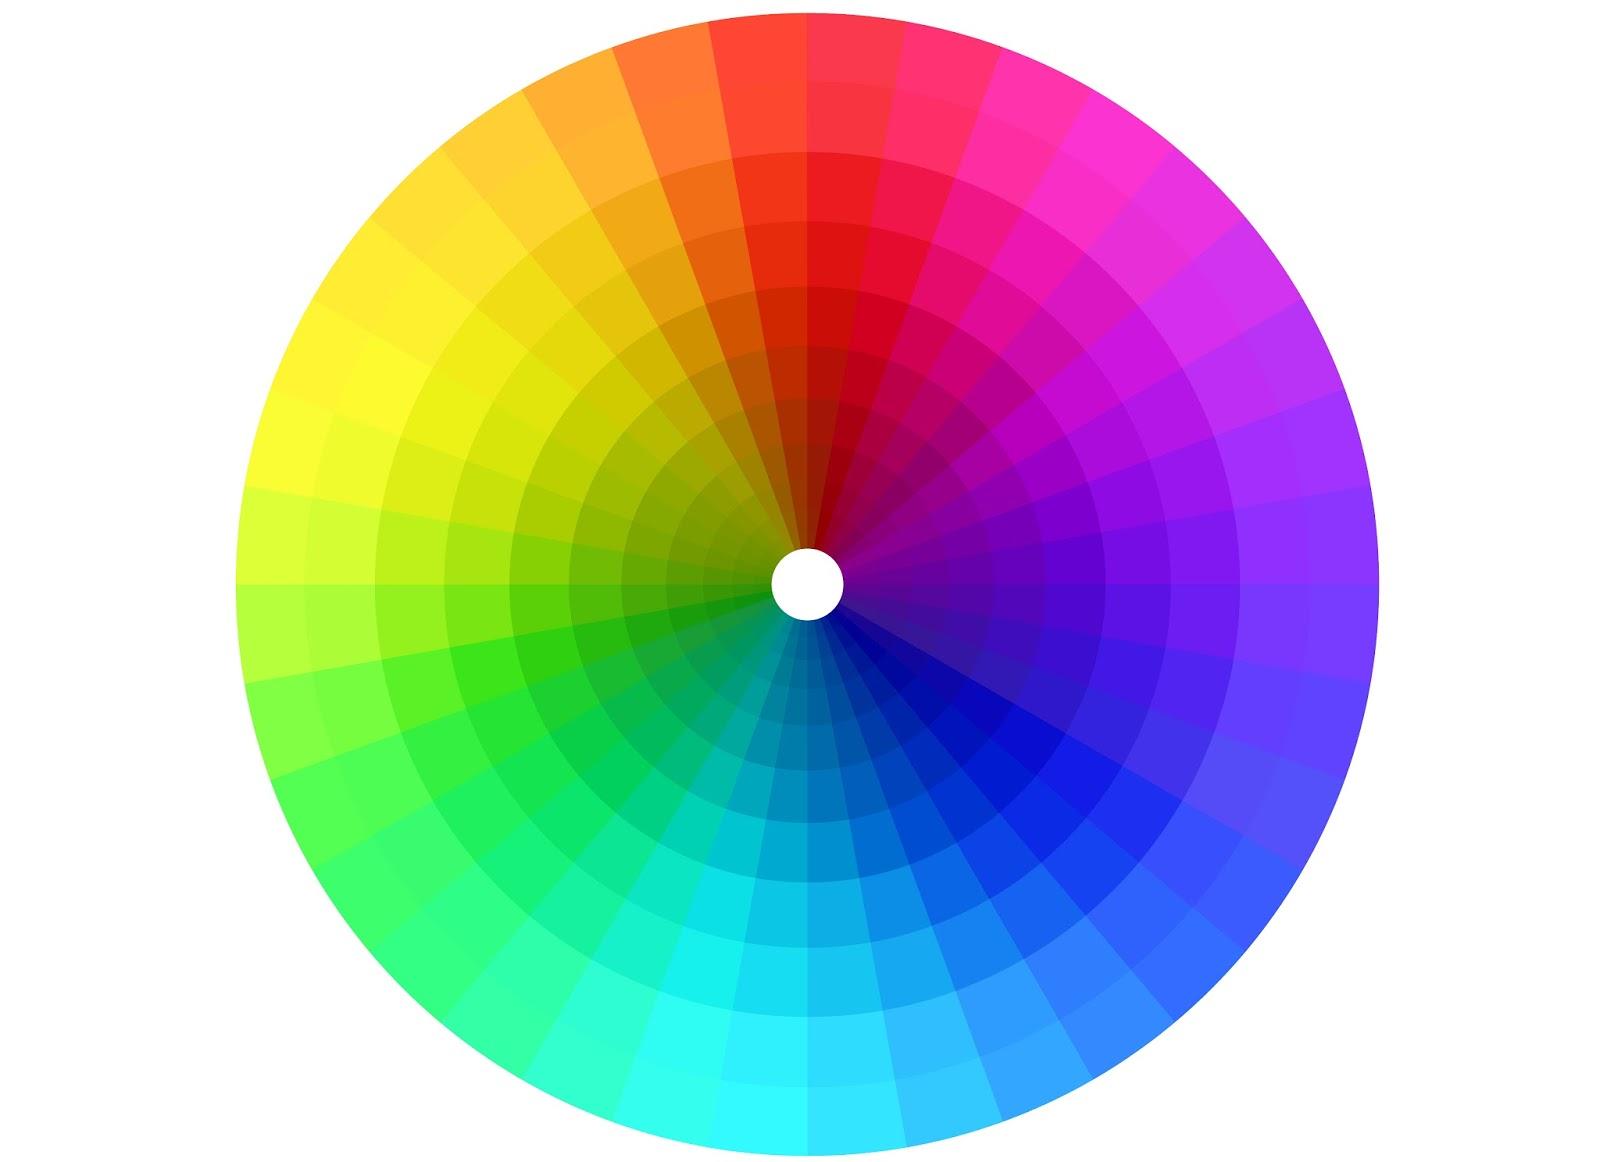 Психология цветового восприятия